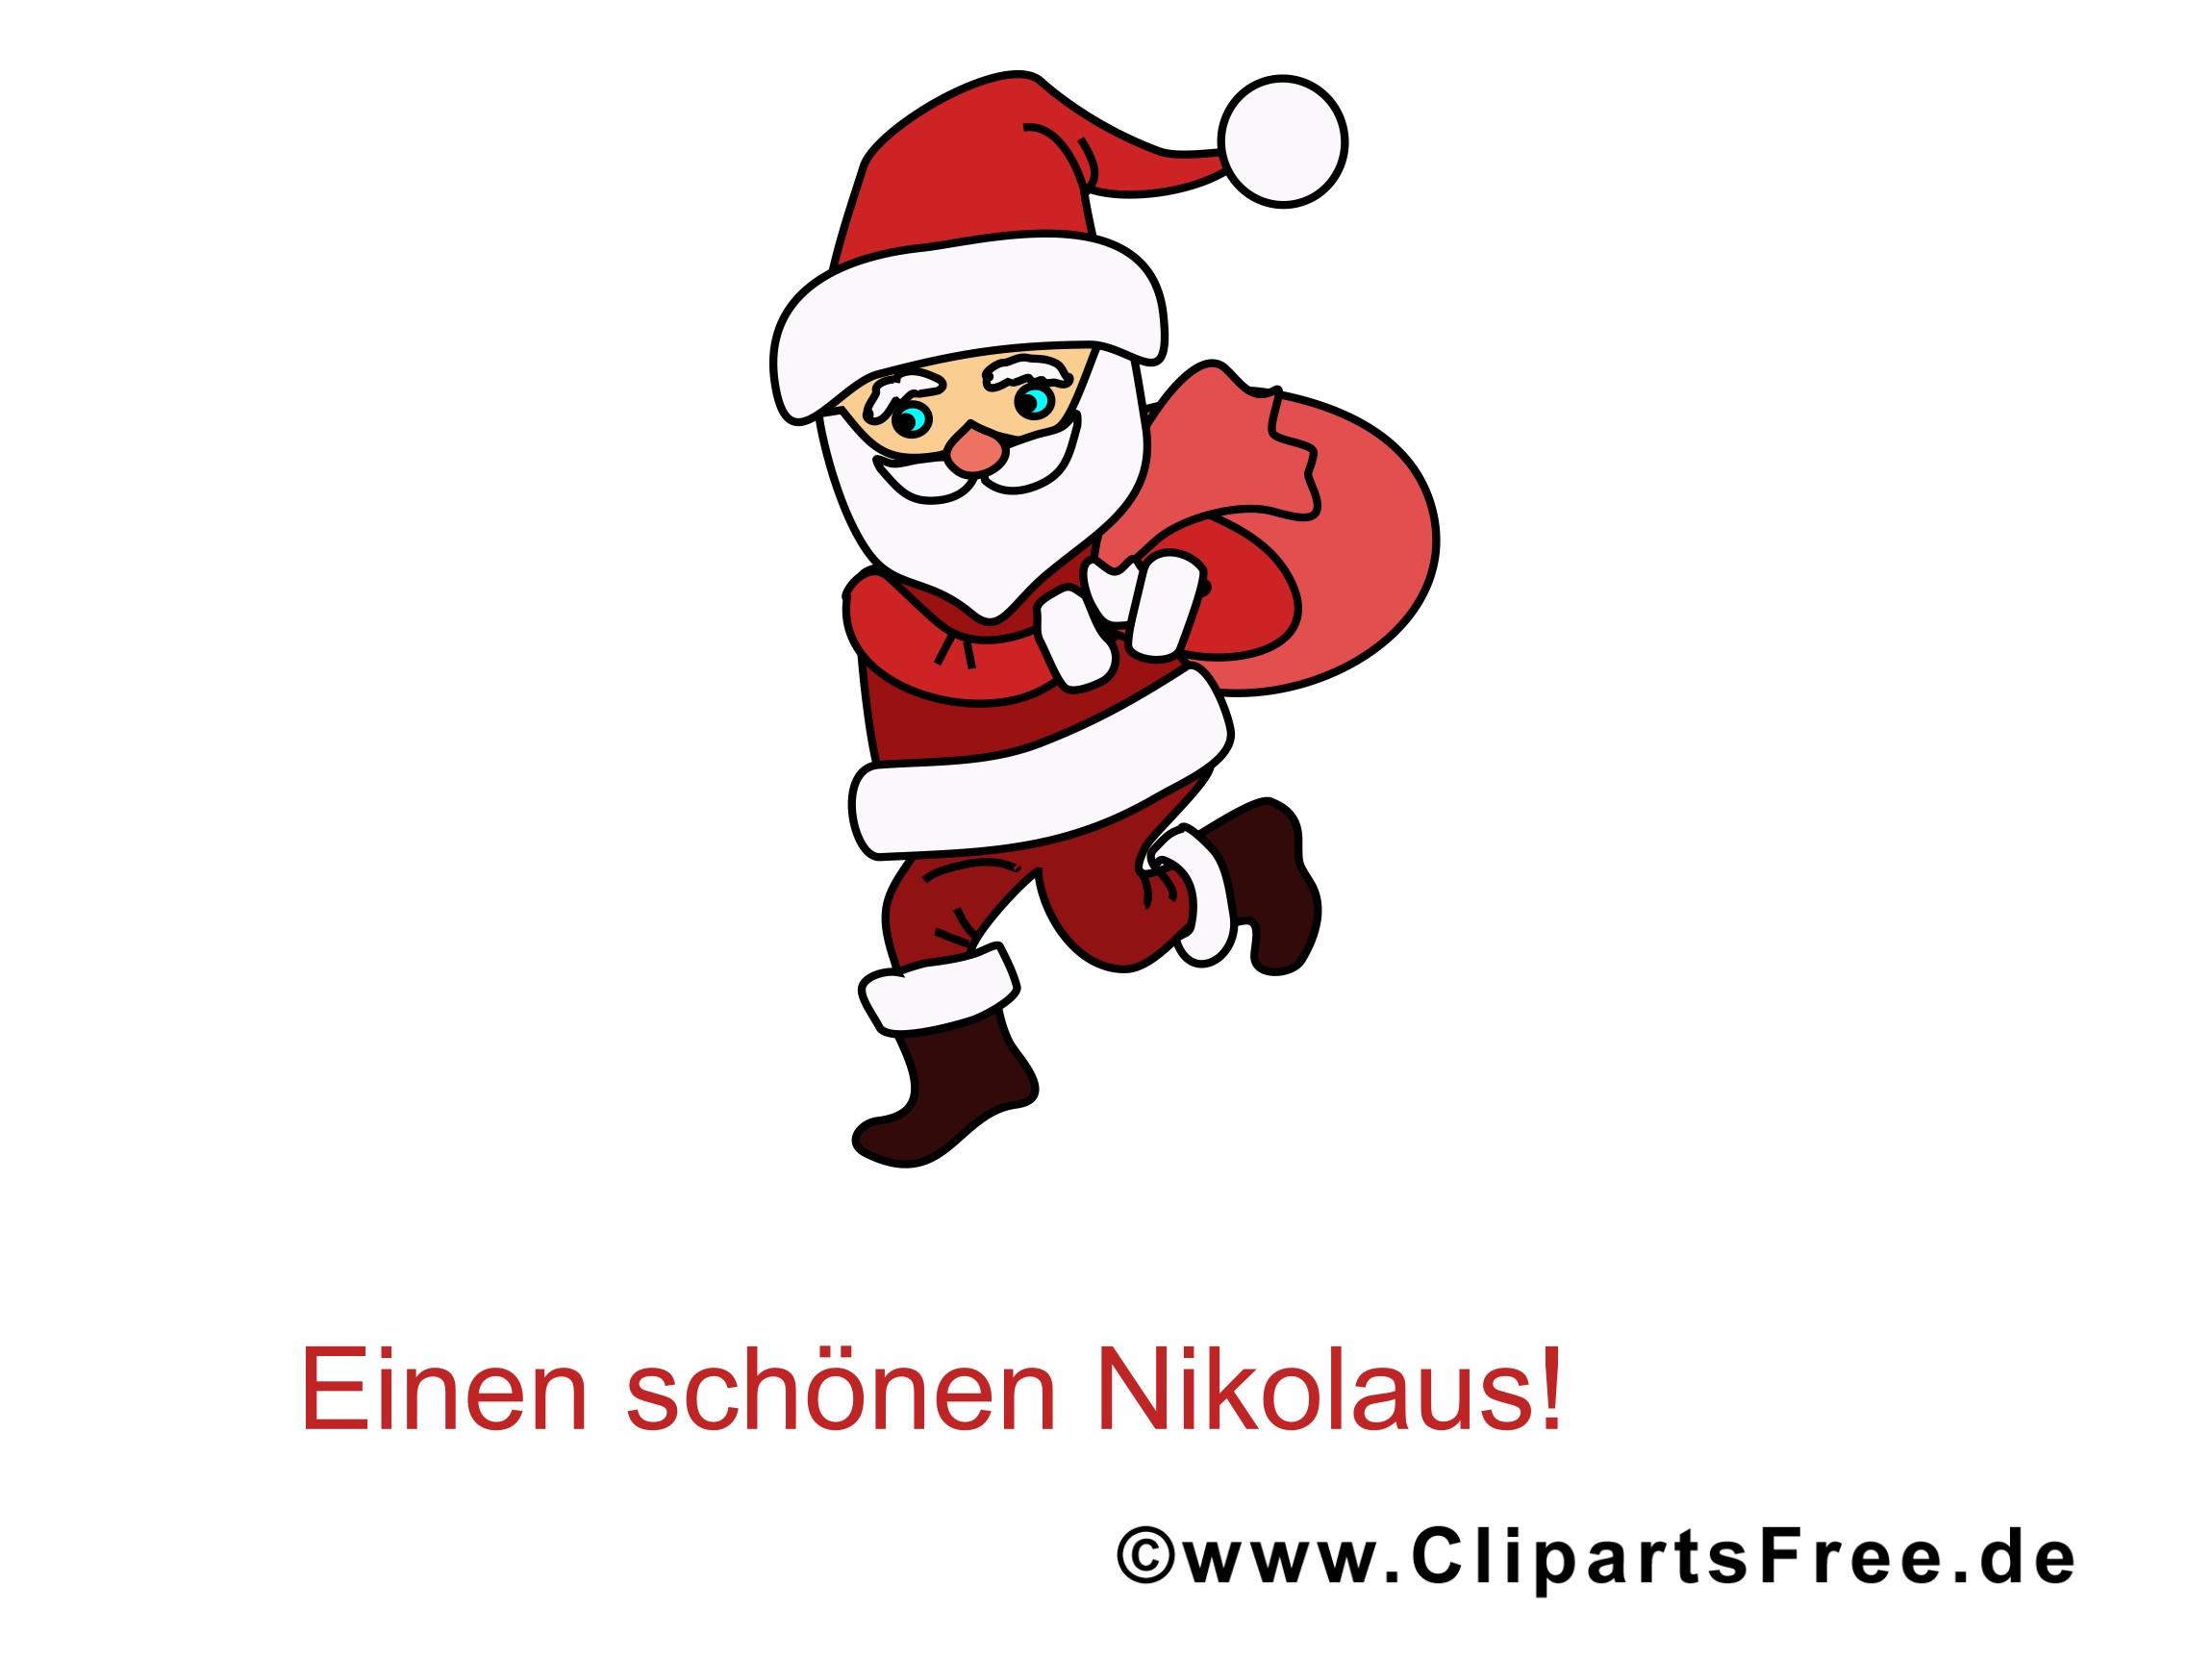 Nikolaus Bilder Gratis über Nikolausbilder Kostenlos » Clipart Portal.